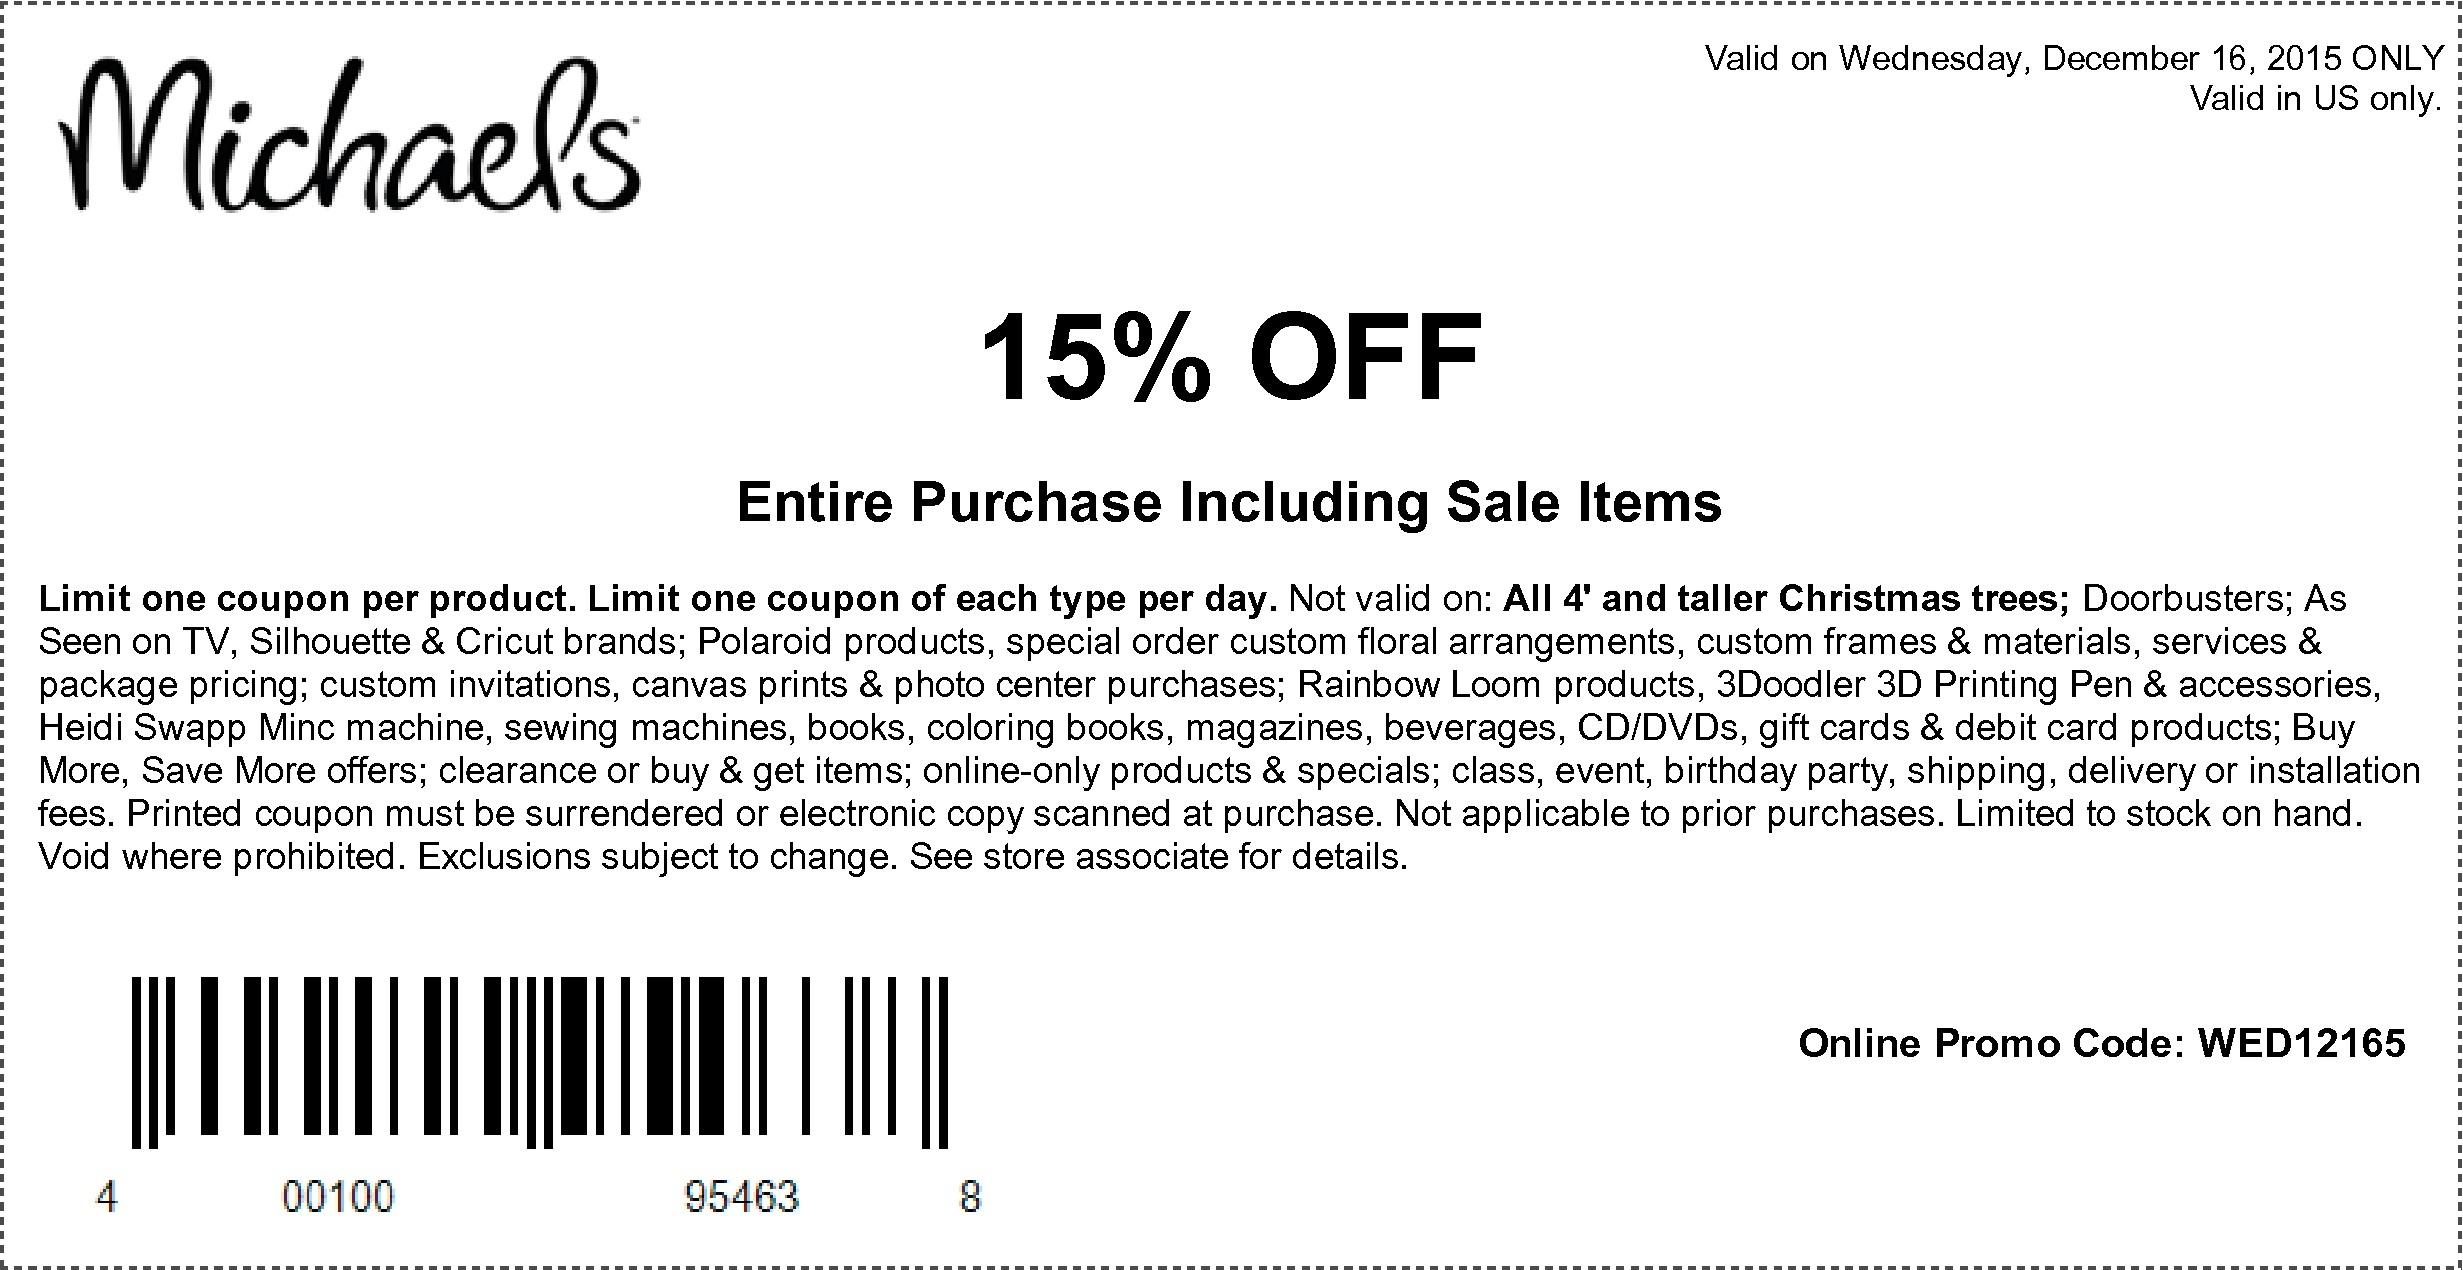 Michaels Free Printable Coupons | Printable Coupons Online - Free Printable Coupons 2014